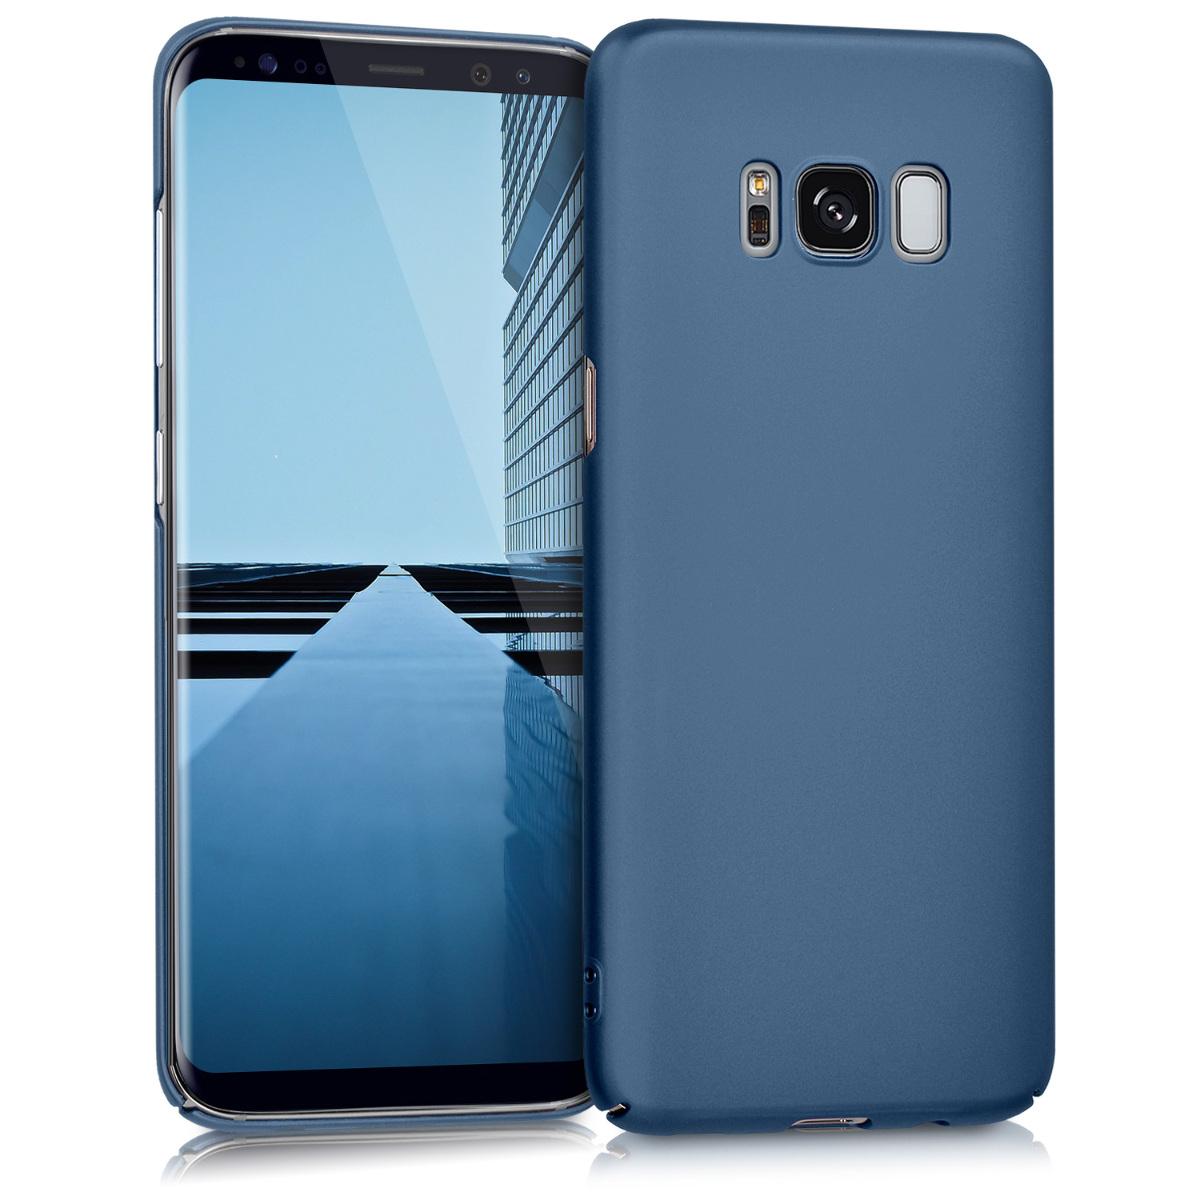 KW Slim Anti-Slip Cover - Σκληρή Θήκη Καουτσούκ Samsung Galaxy S8 - Μπλε μεταλλικό (41800.64)